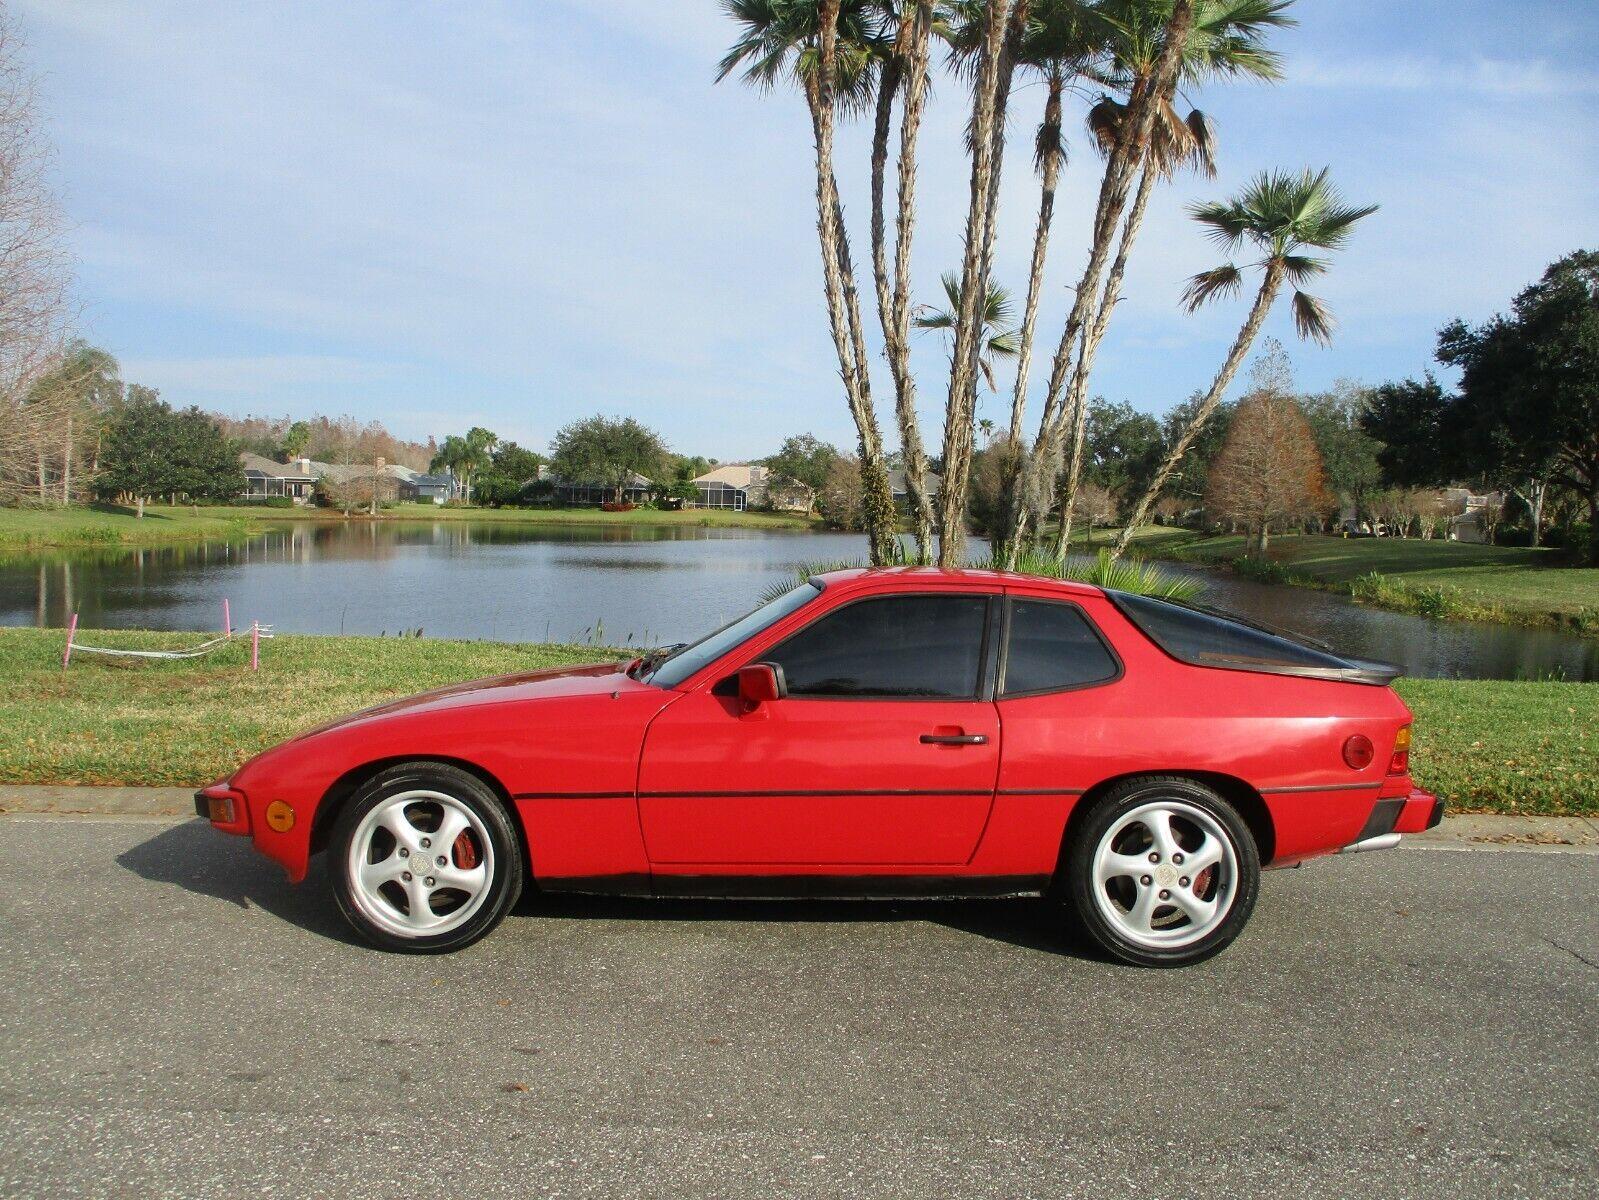 1987 PORSCHE 924 S  BEAUTIFUL CAR   BEST COLOR COMBO SUNROOF LOADED LOTS OF FUN